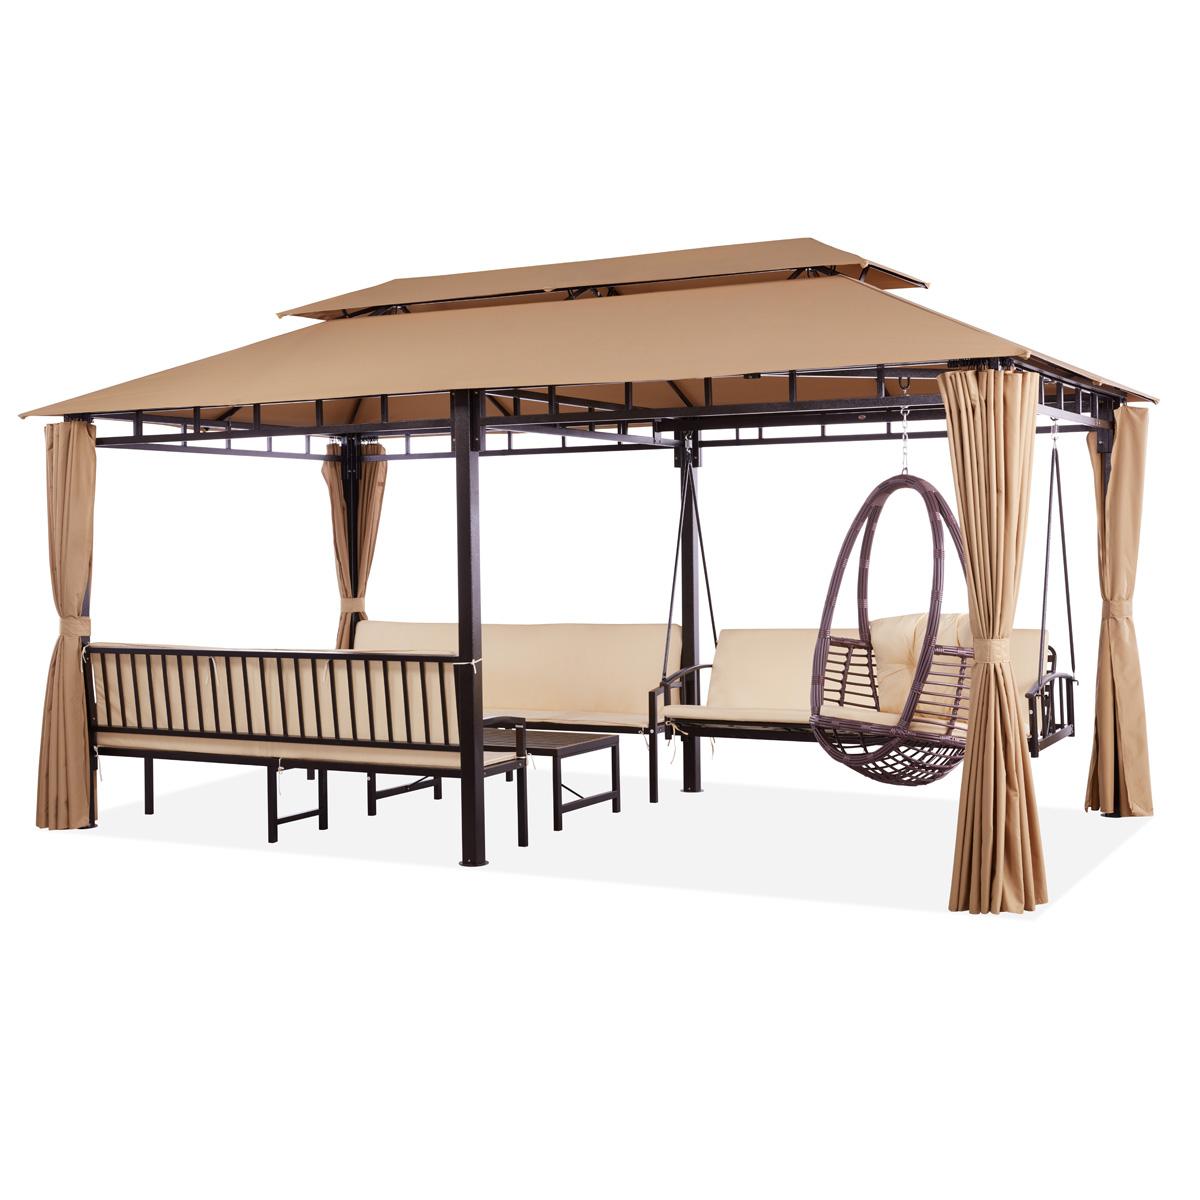 Ajanta All In One Gazebo Regarding Patio Gazebo Porch Canopy Swings (View 21 of 25)